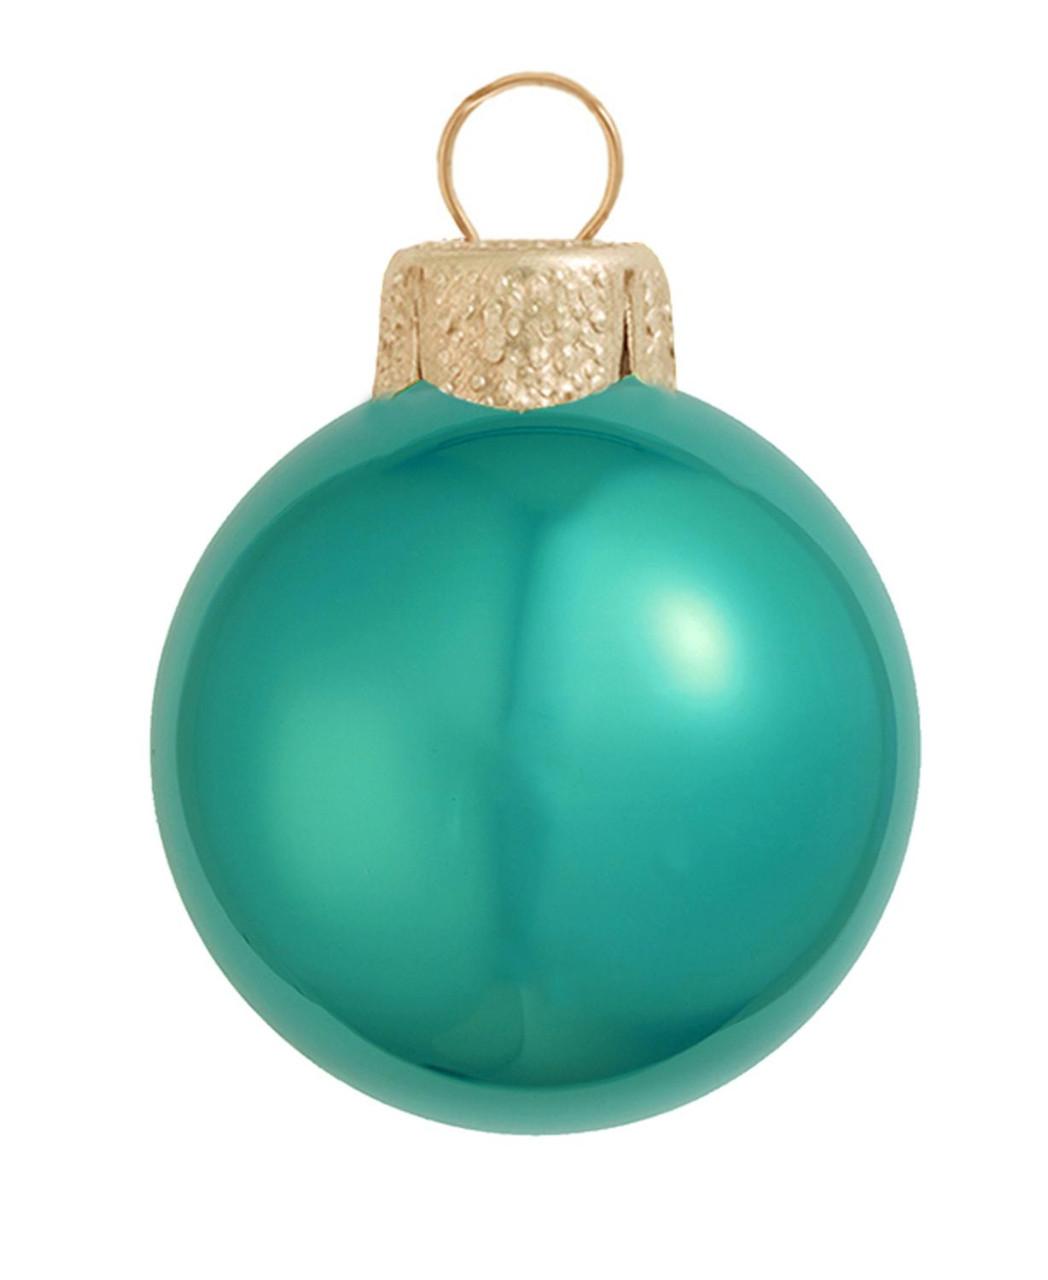 INGE BUBI /& HANSI SILVER CANARY PARROT GERMAN GLASS CHRISTMAS TREE ORNAMENT BIRD